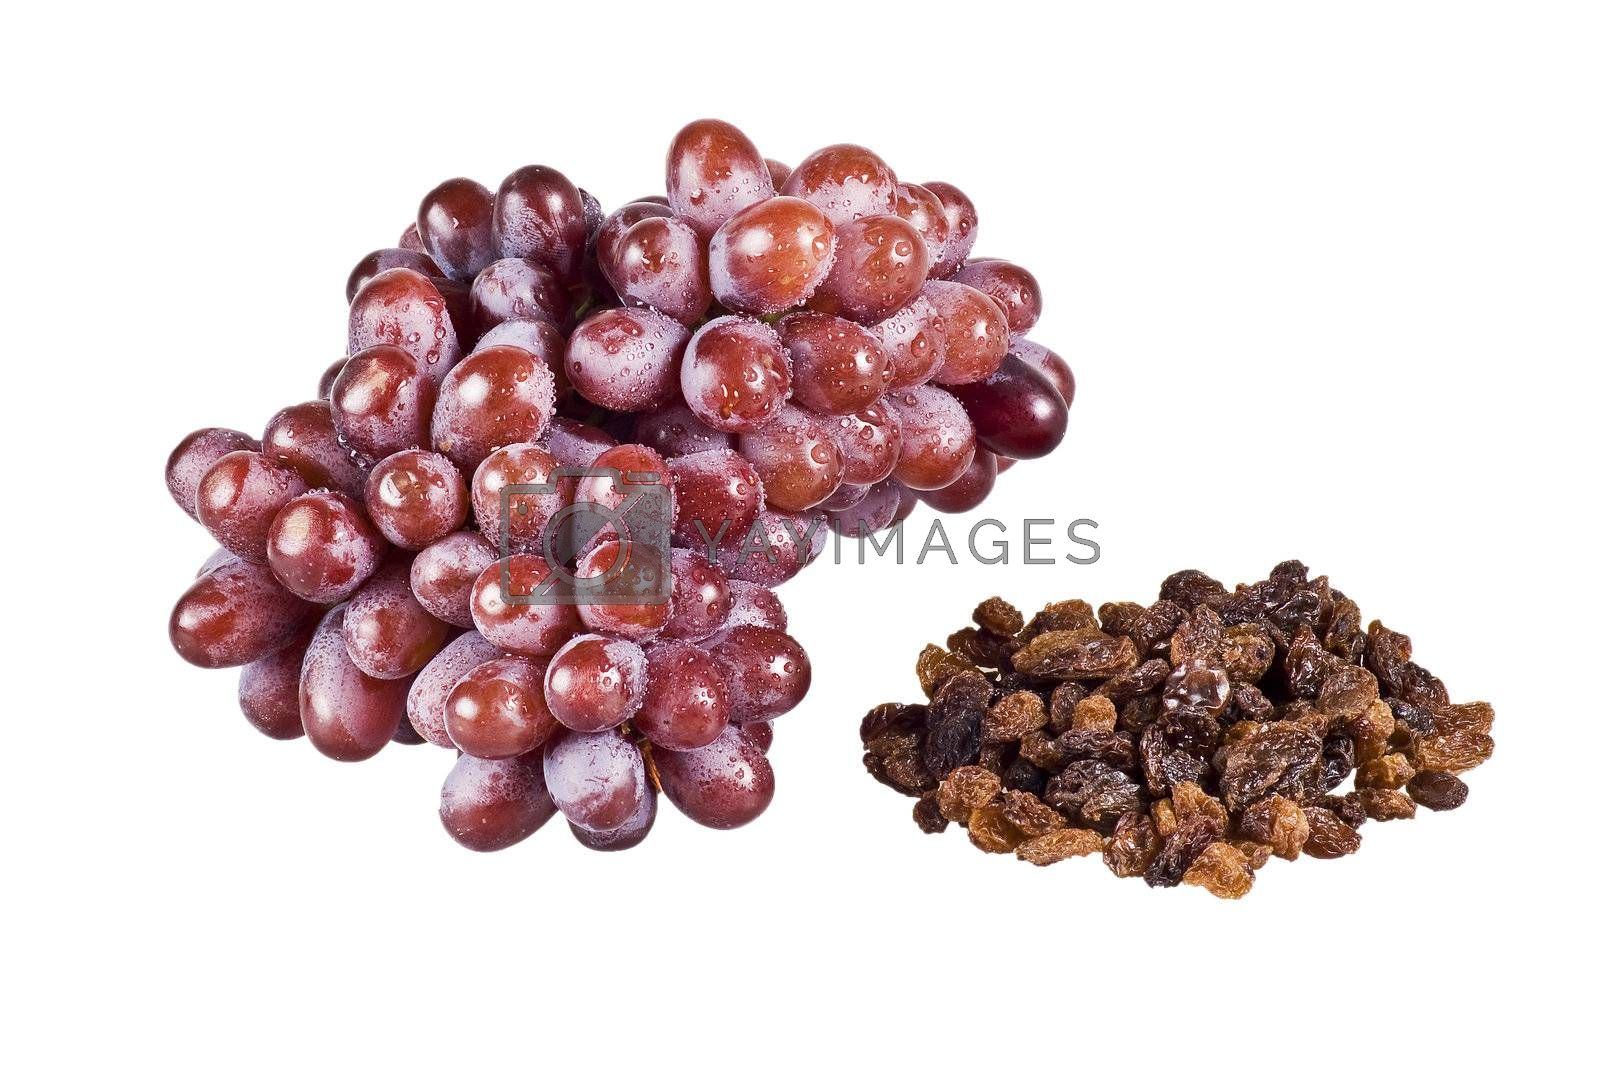 Bunch of grapes and raisins by caldix